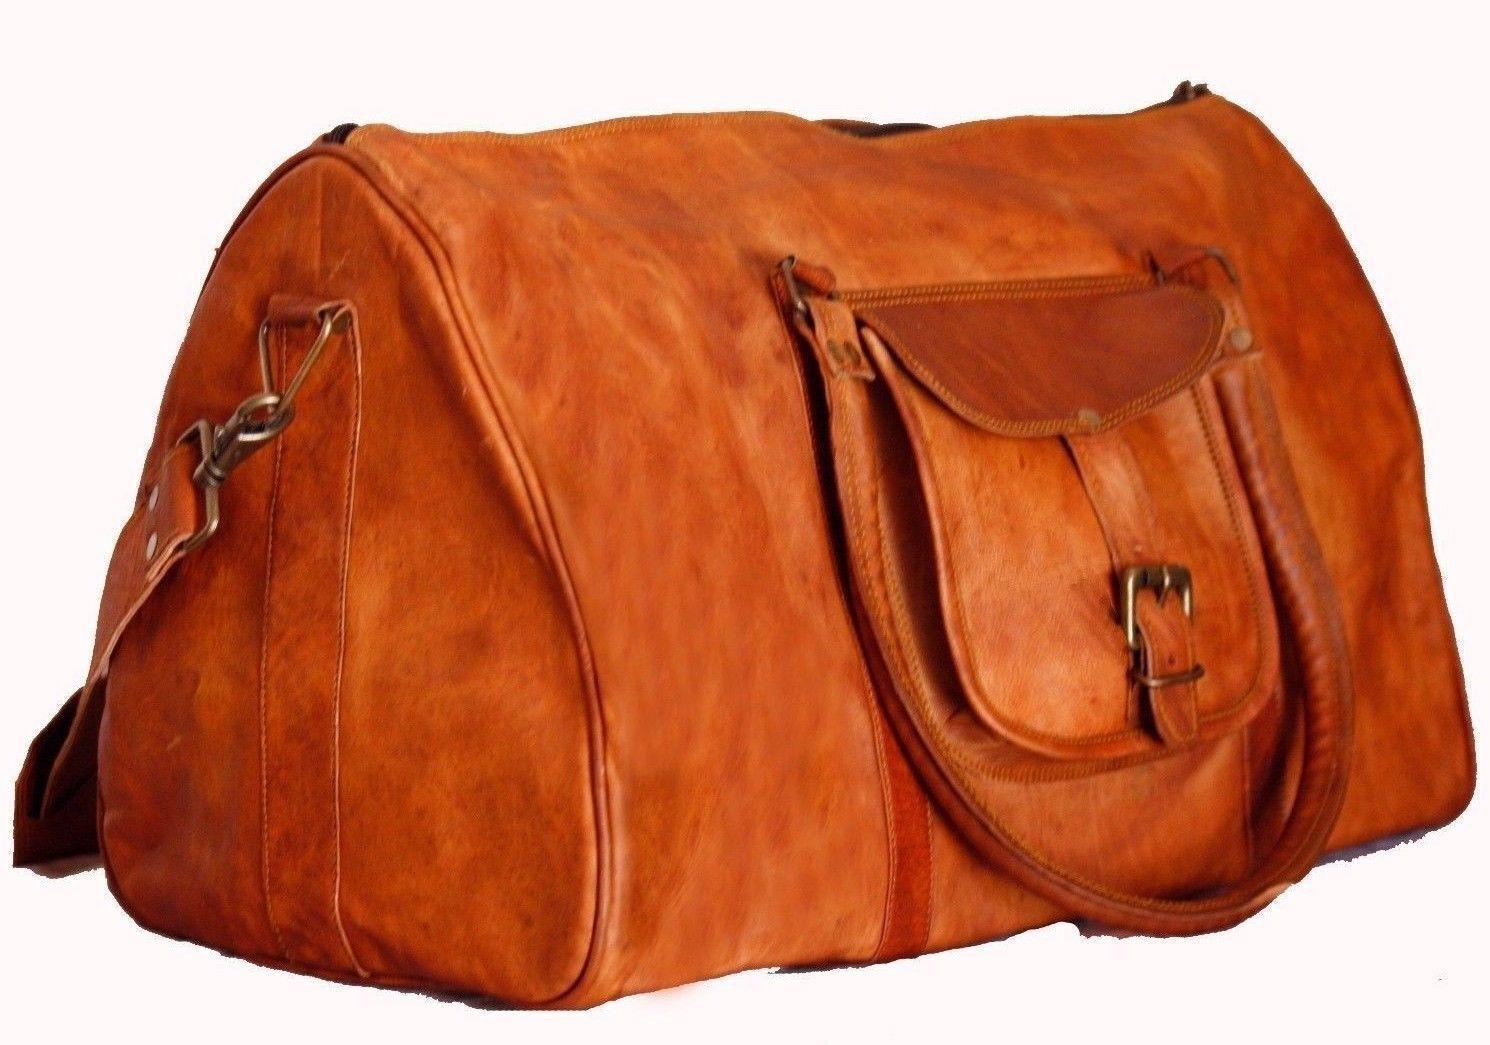 Men's genuine Leather large vintage duffle travel gym weeken